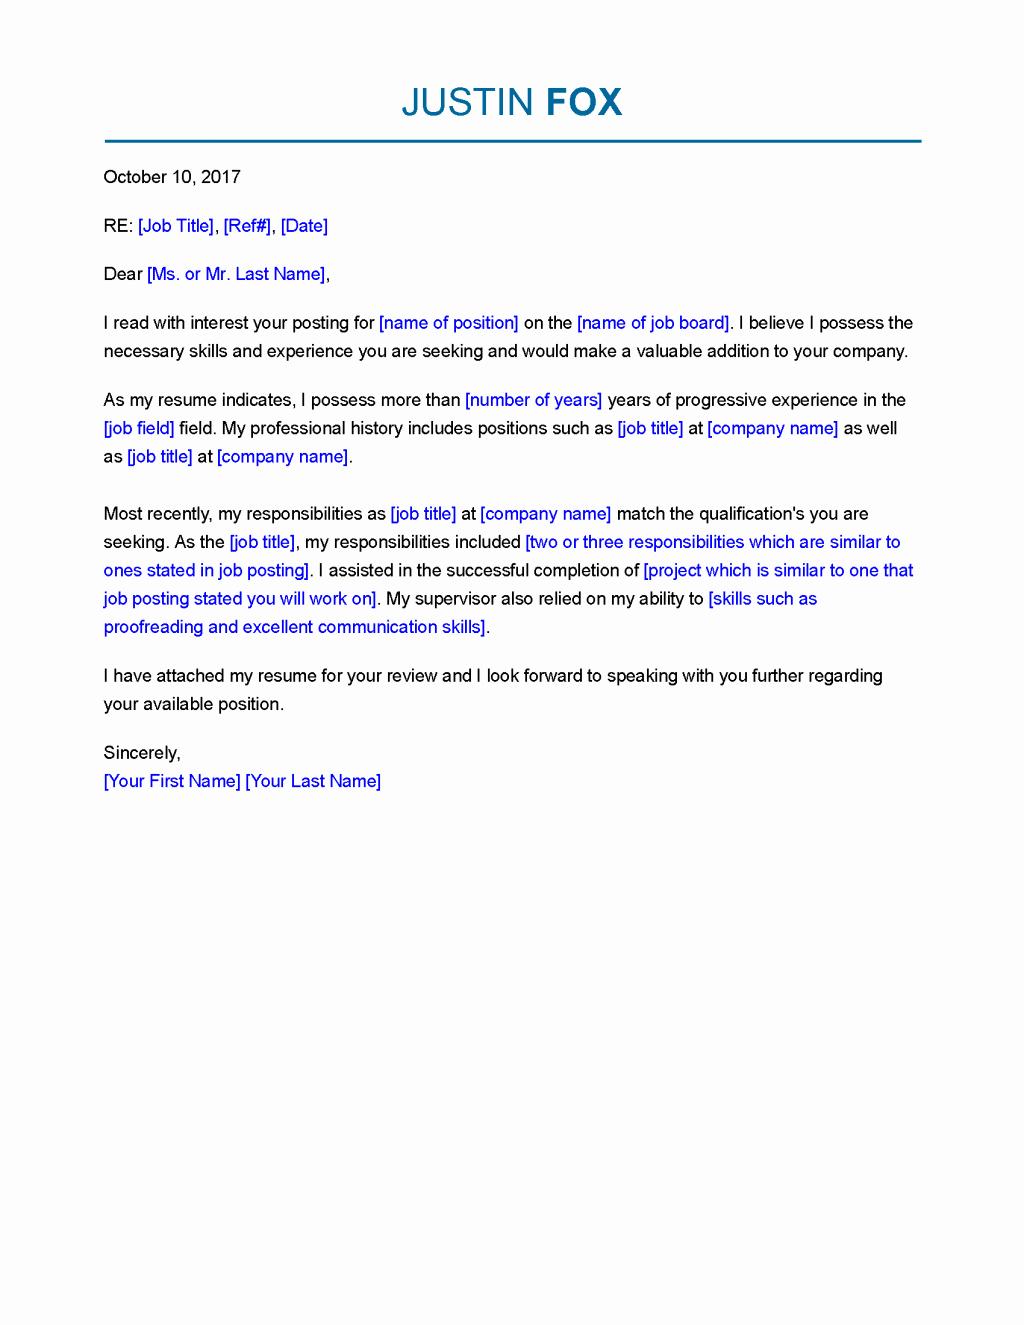 Free Resume Cover Letter Template Unique Resume and Template 59 Resume Cover Letter Template